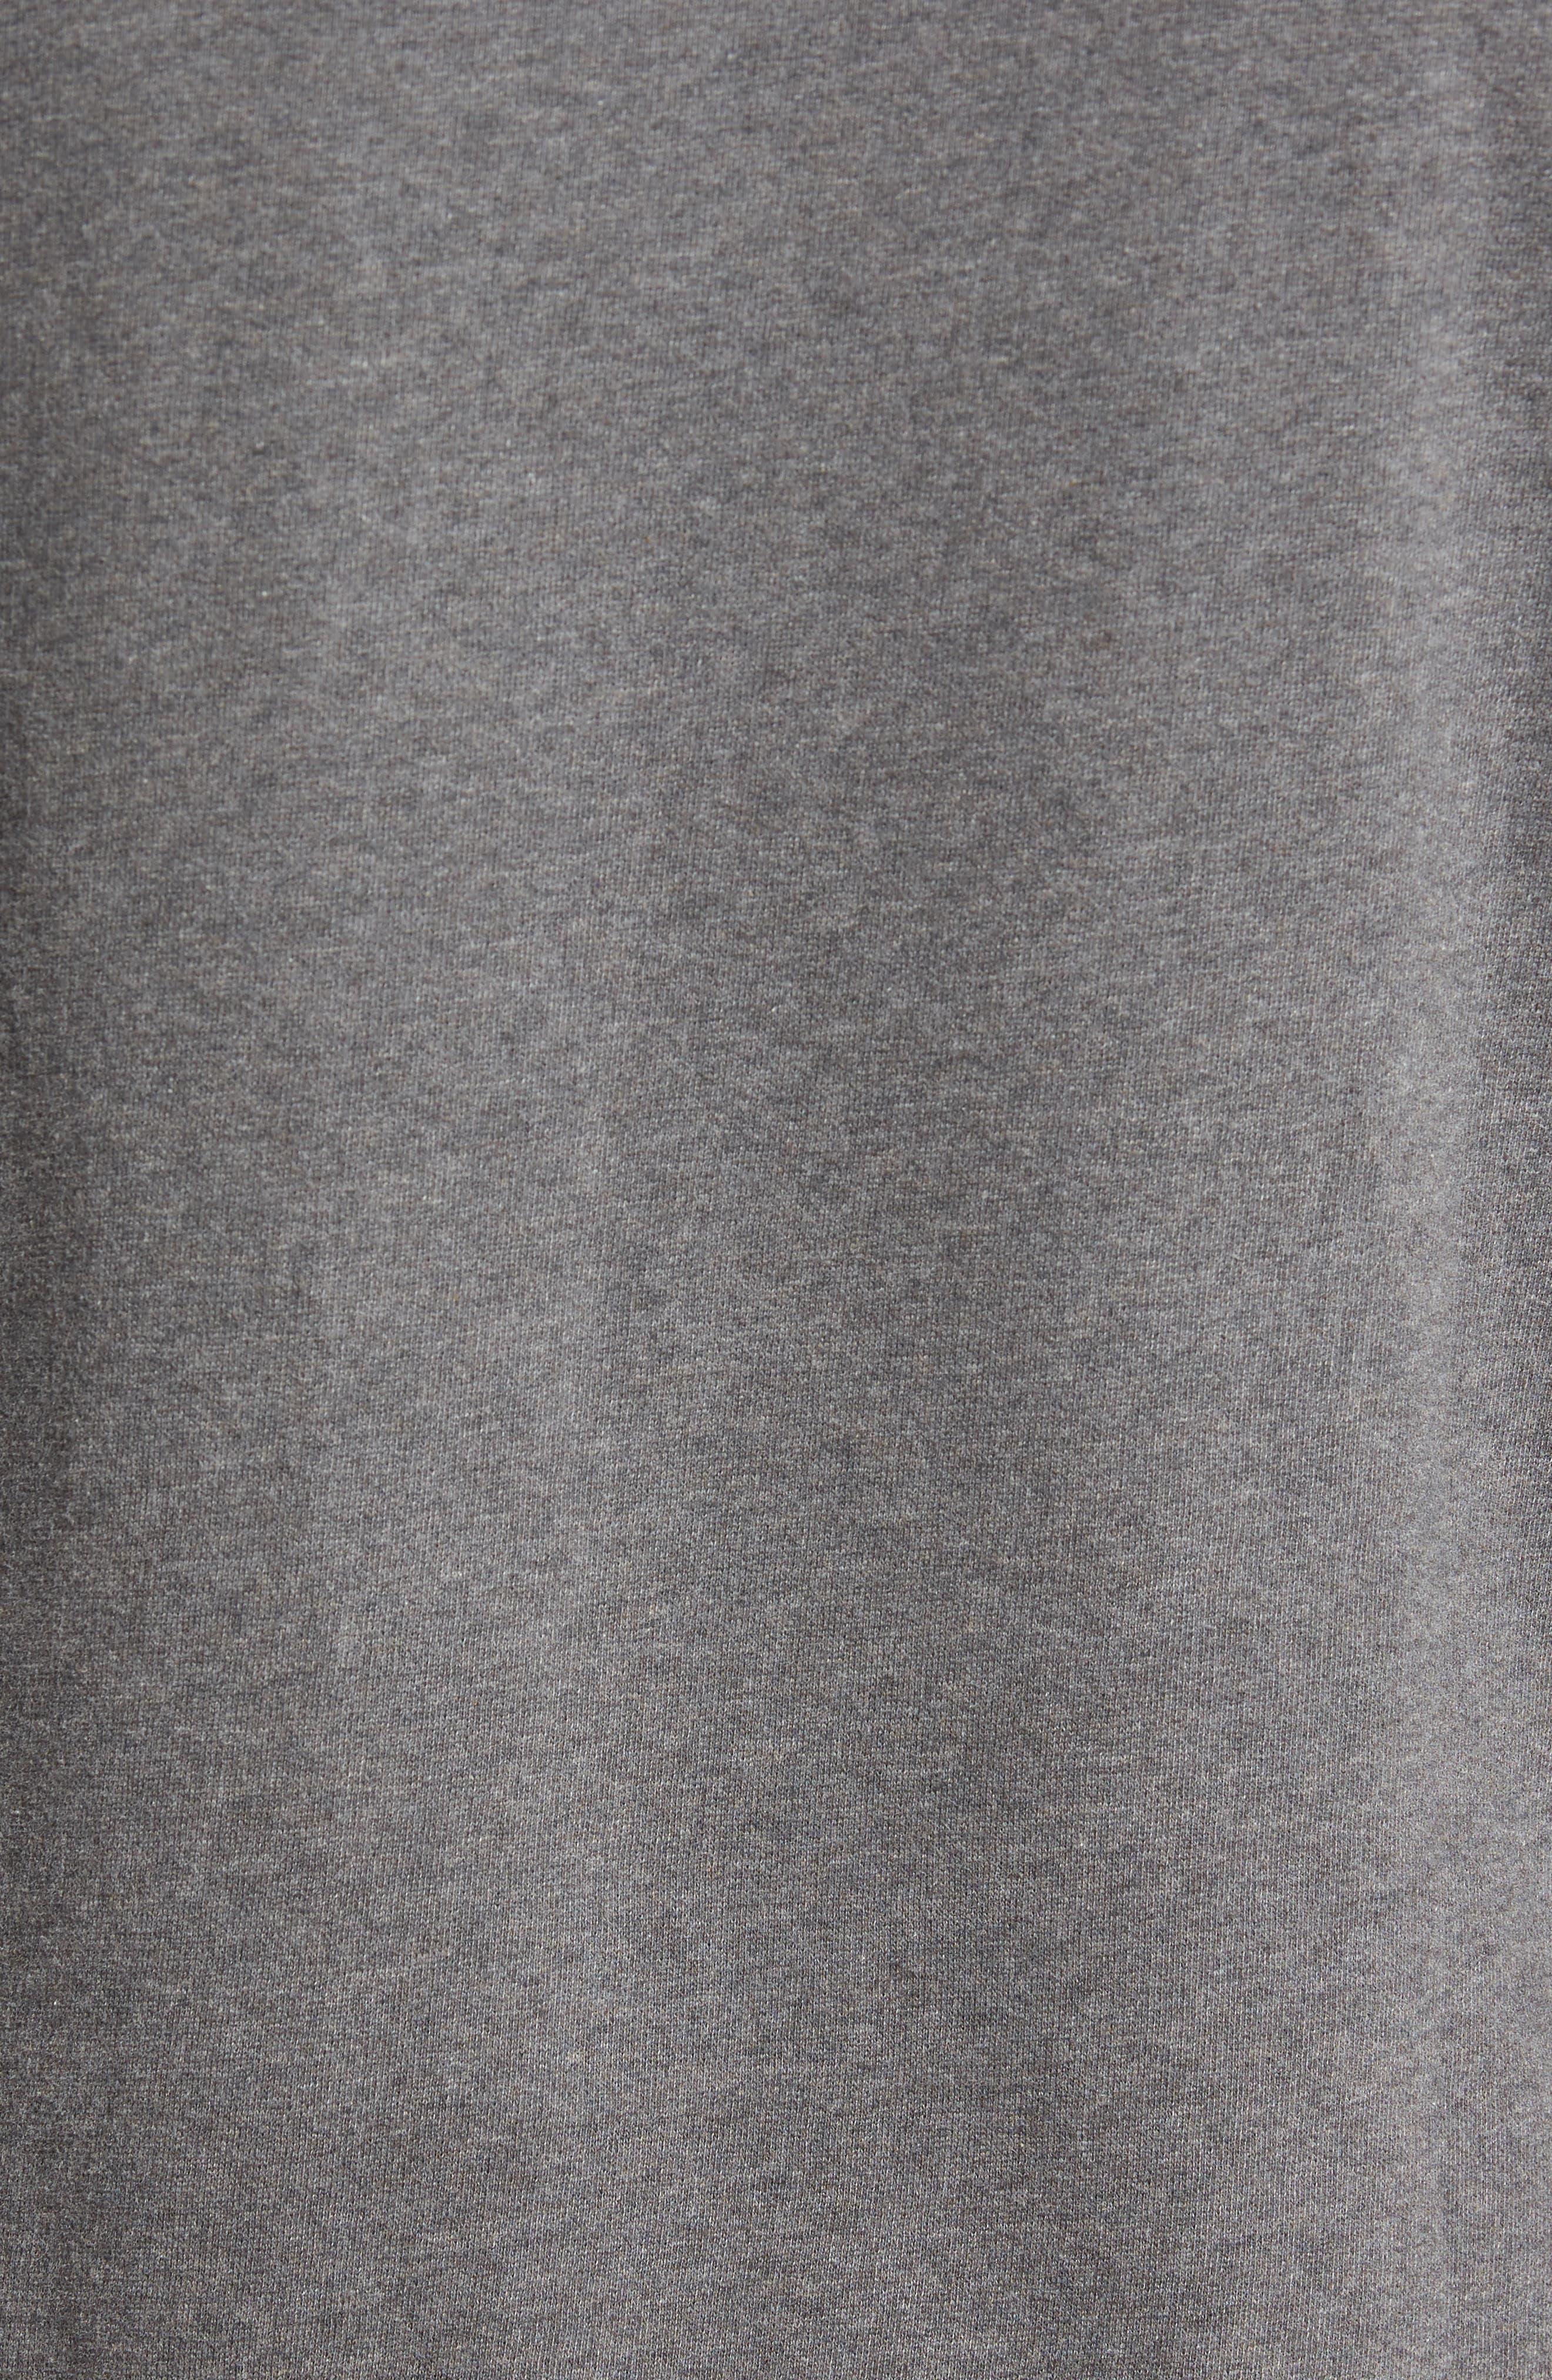 Tweed Appliqué Sweatshirt,                             Alternate thumbnail 5, color,                             Charcoal Melange